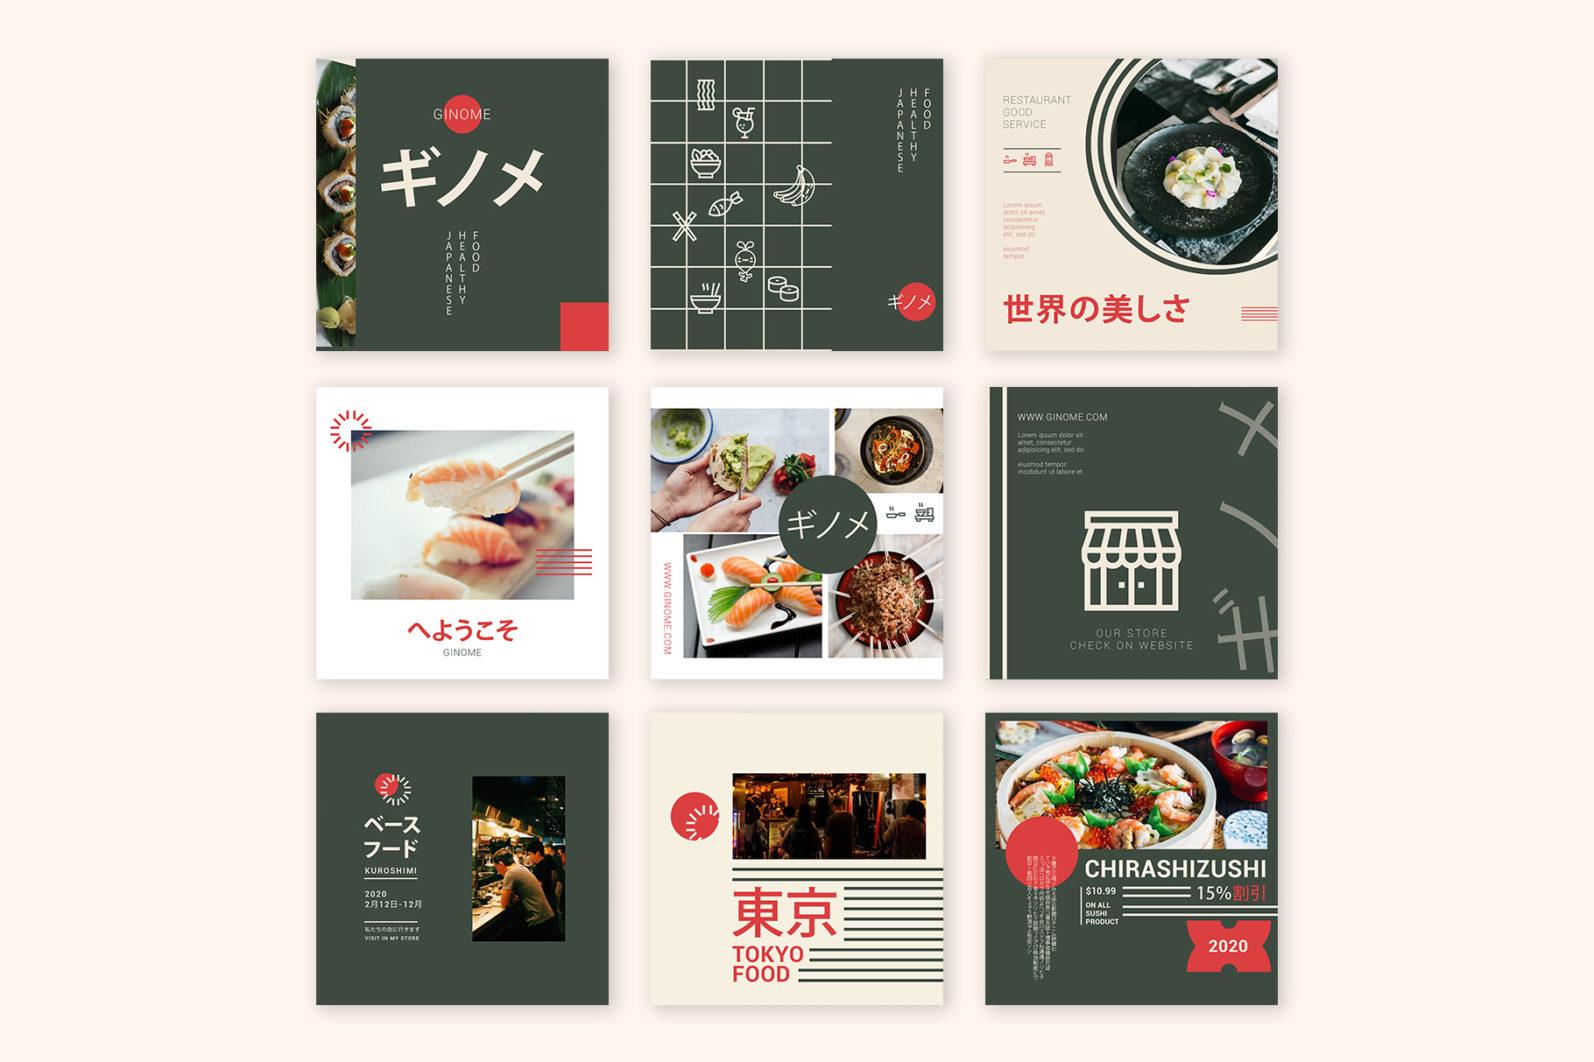 Japan Food Instagram Templates - new mockupp2 copy 3 -